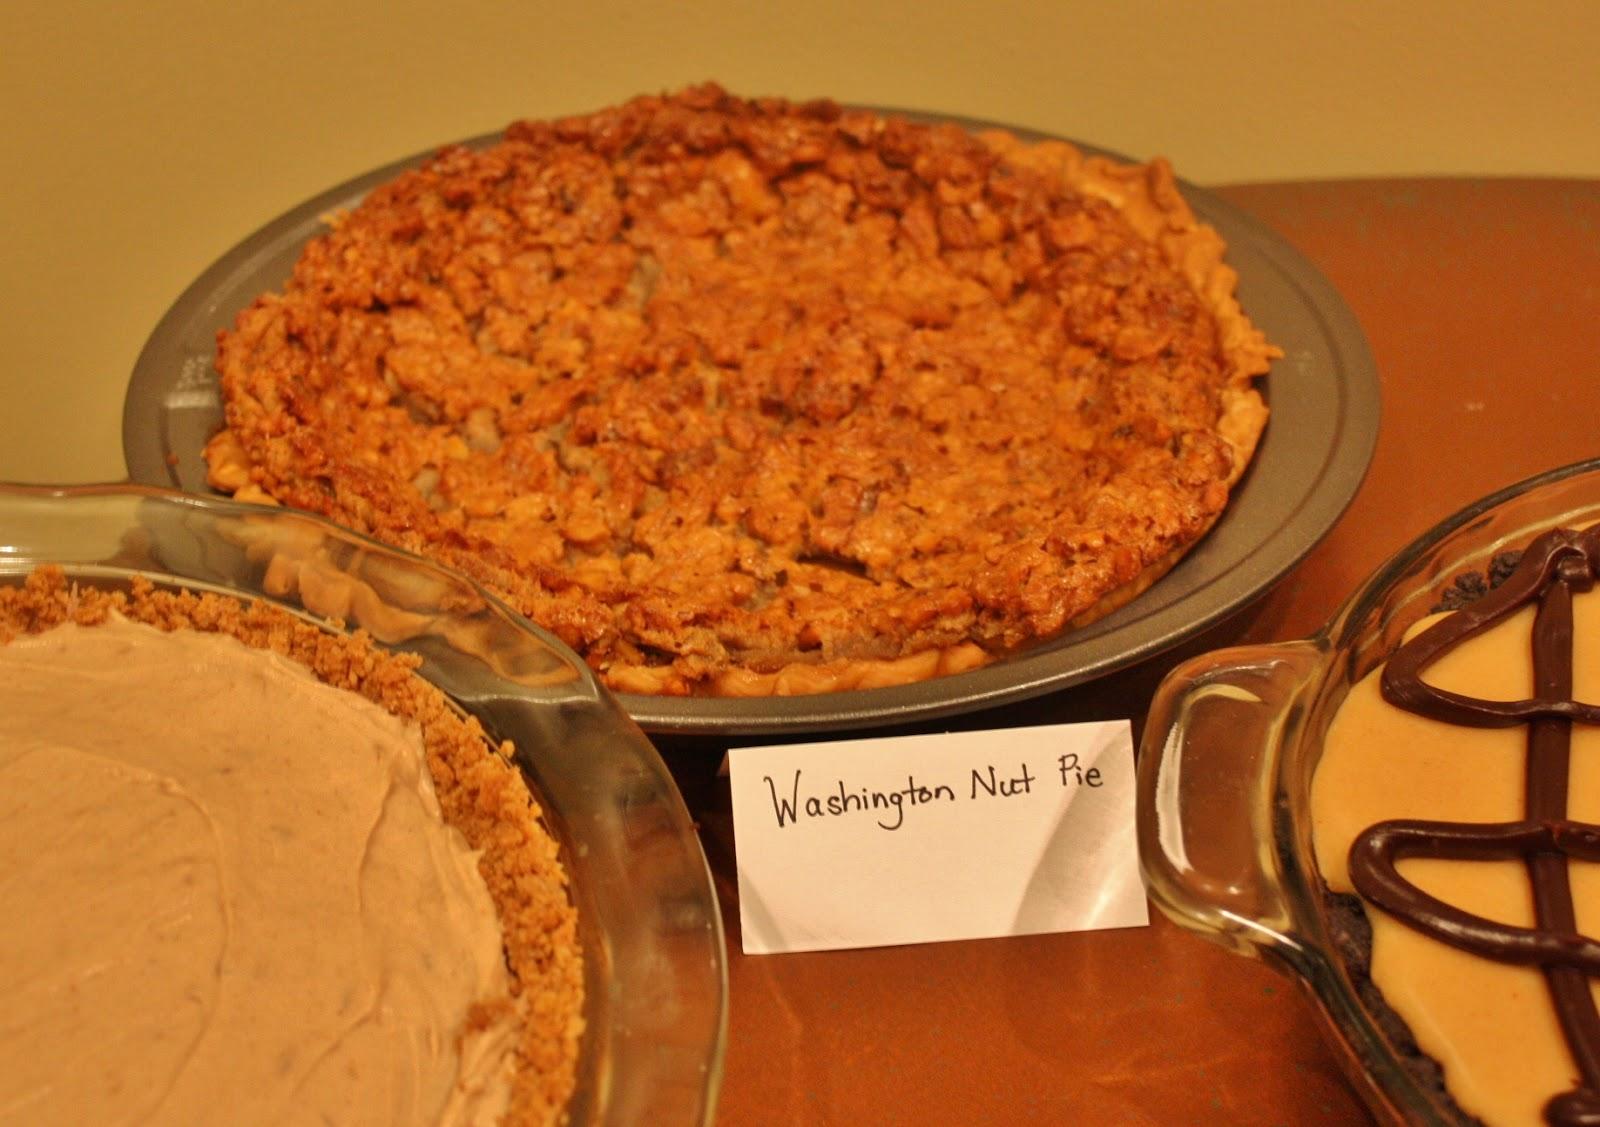 ... favorites- Washington Nut Pie (similar to pecan but made with walnuts